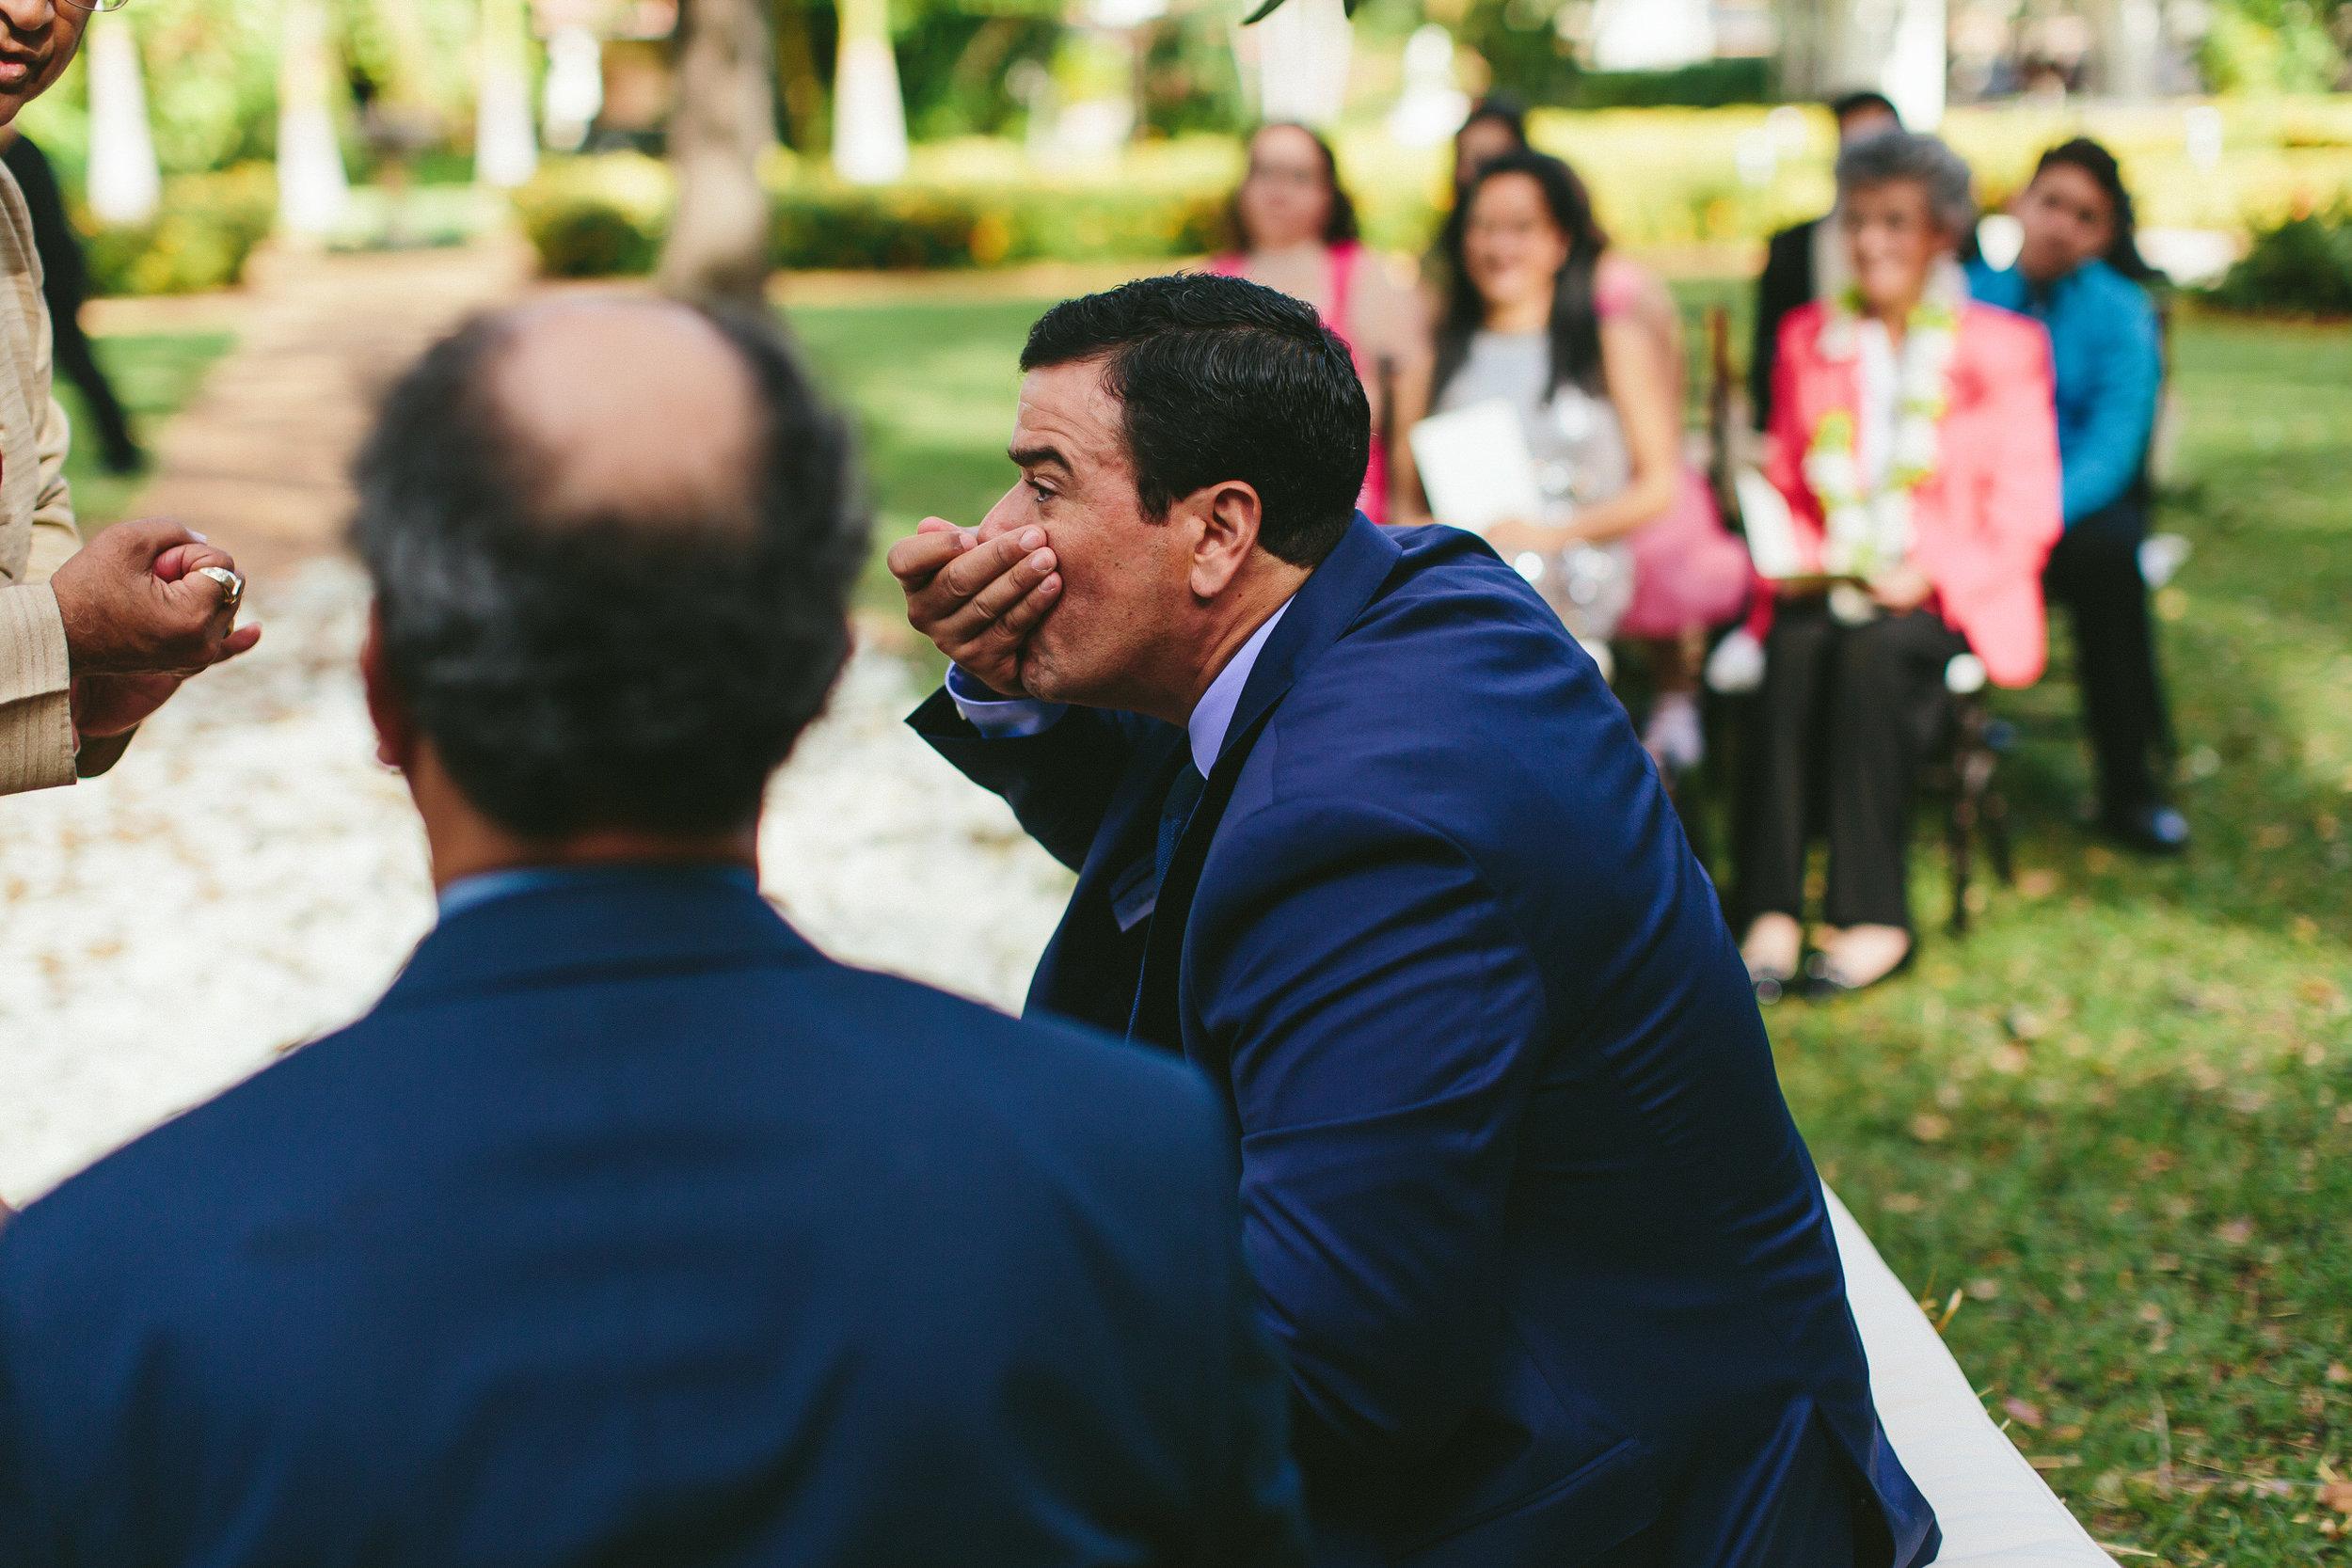 indian-wedding-ceremony-spanish-monastery-tiny-house-photo-miami.jpg